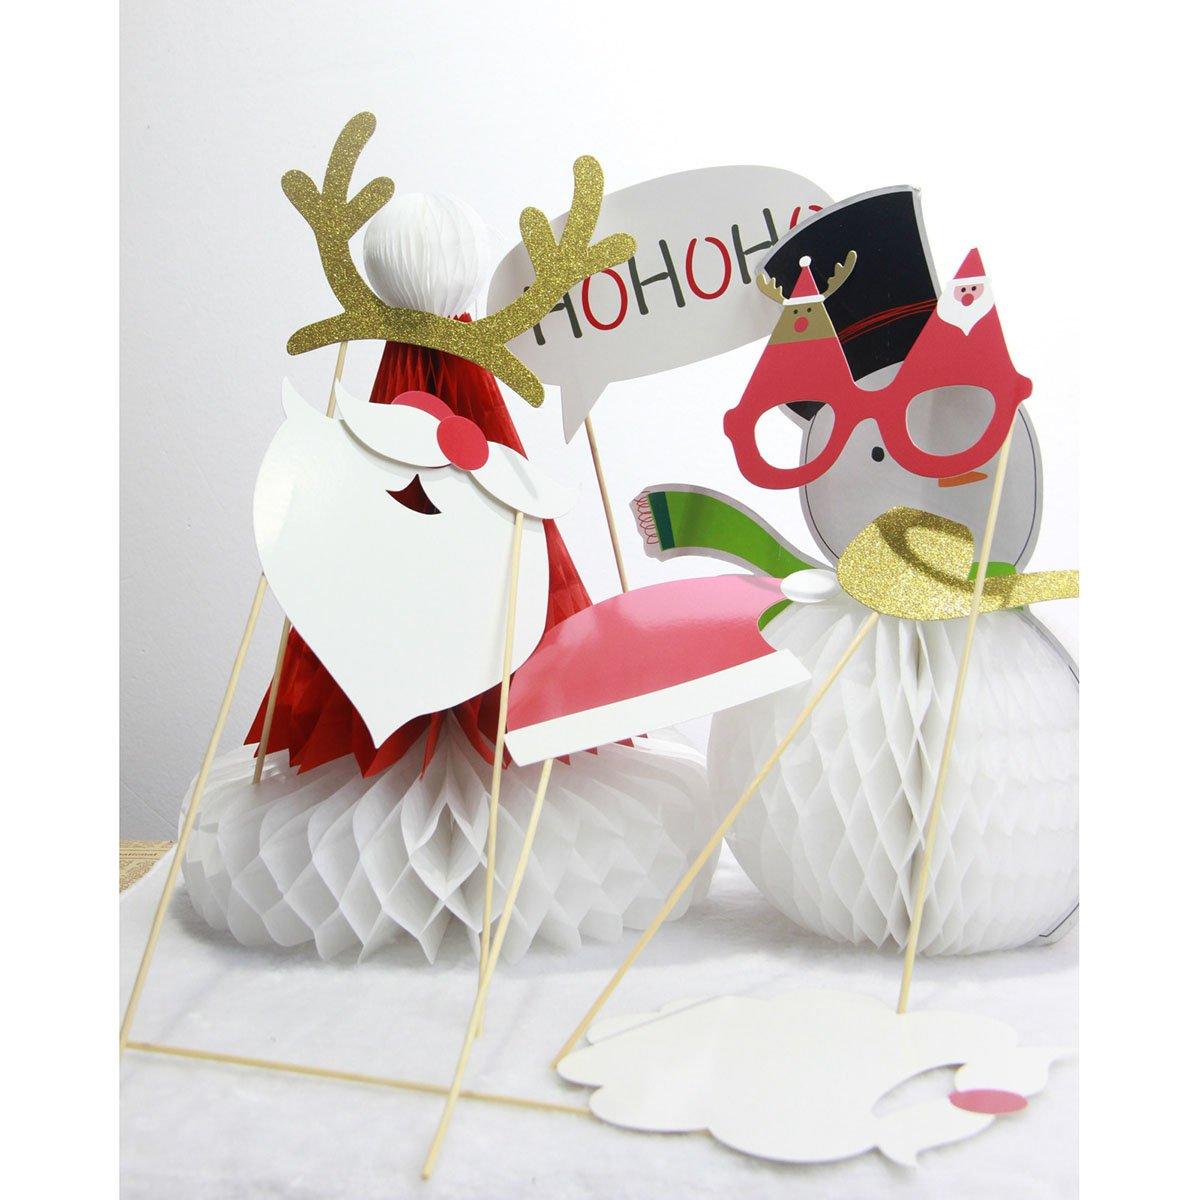 Pixnor Christmas Photobooth Requisiten 8Pieces DIY Kit Funny Photobooth